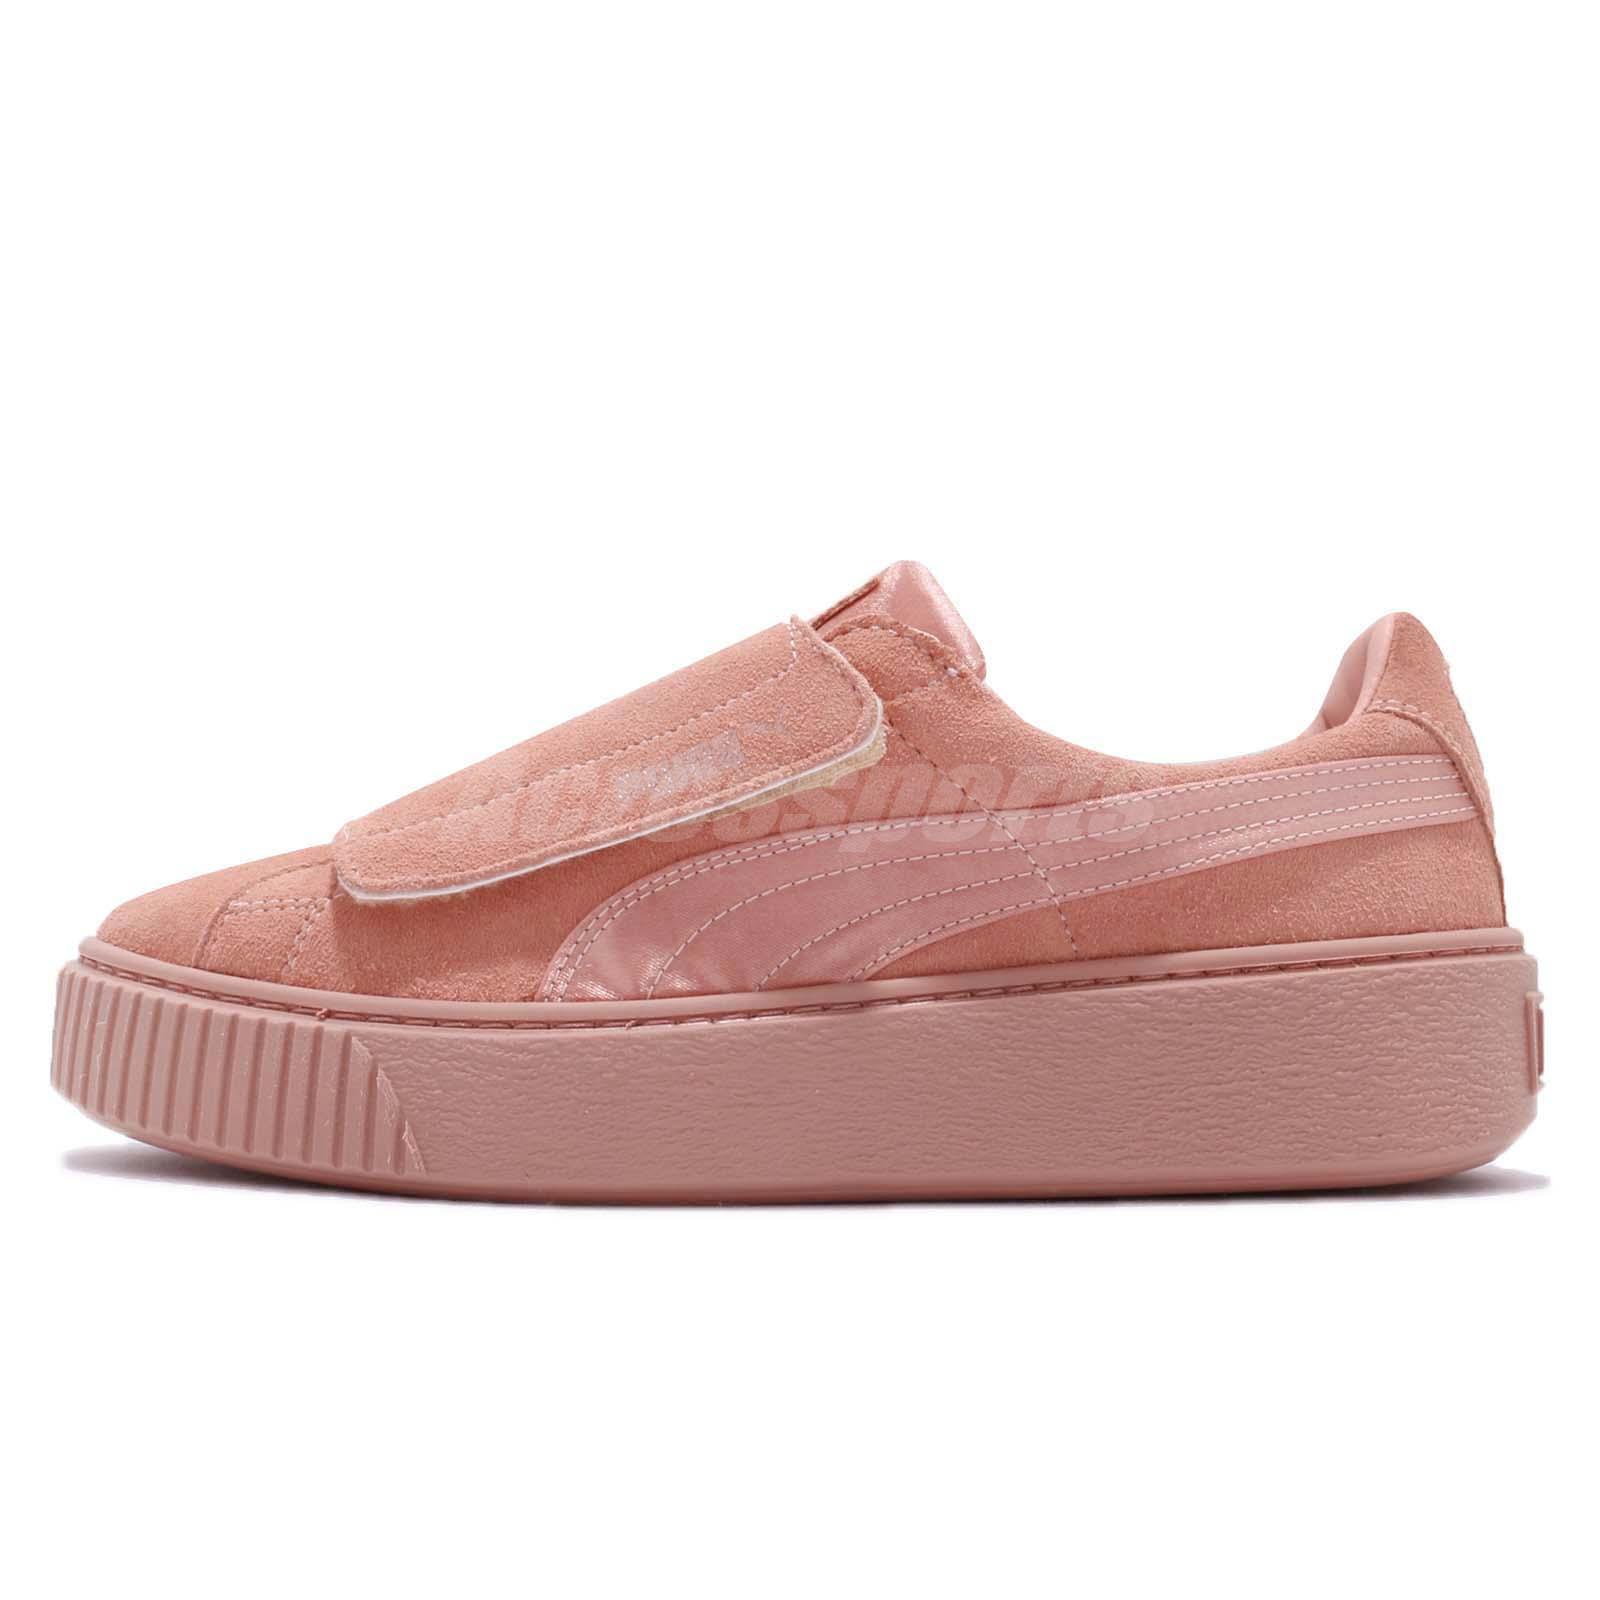 Puma Platform Strap Satin EP Wns Peach Beige Rose Women Shoes Sneakers  366009-01 22115069b